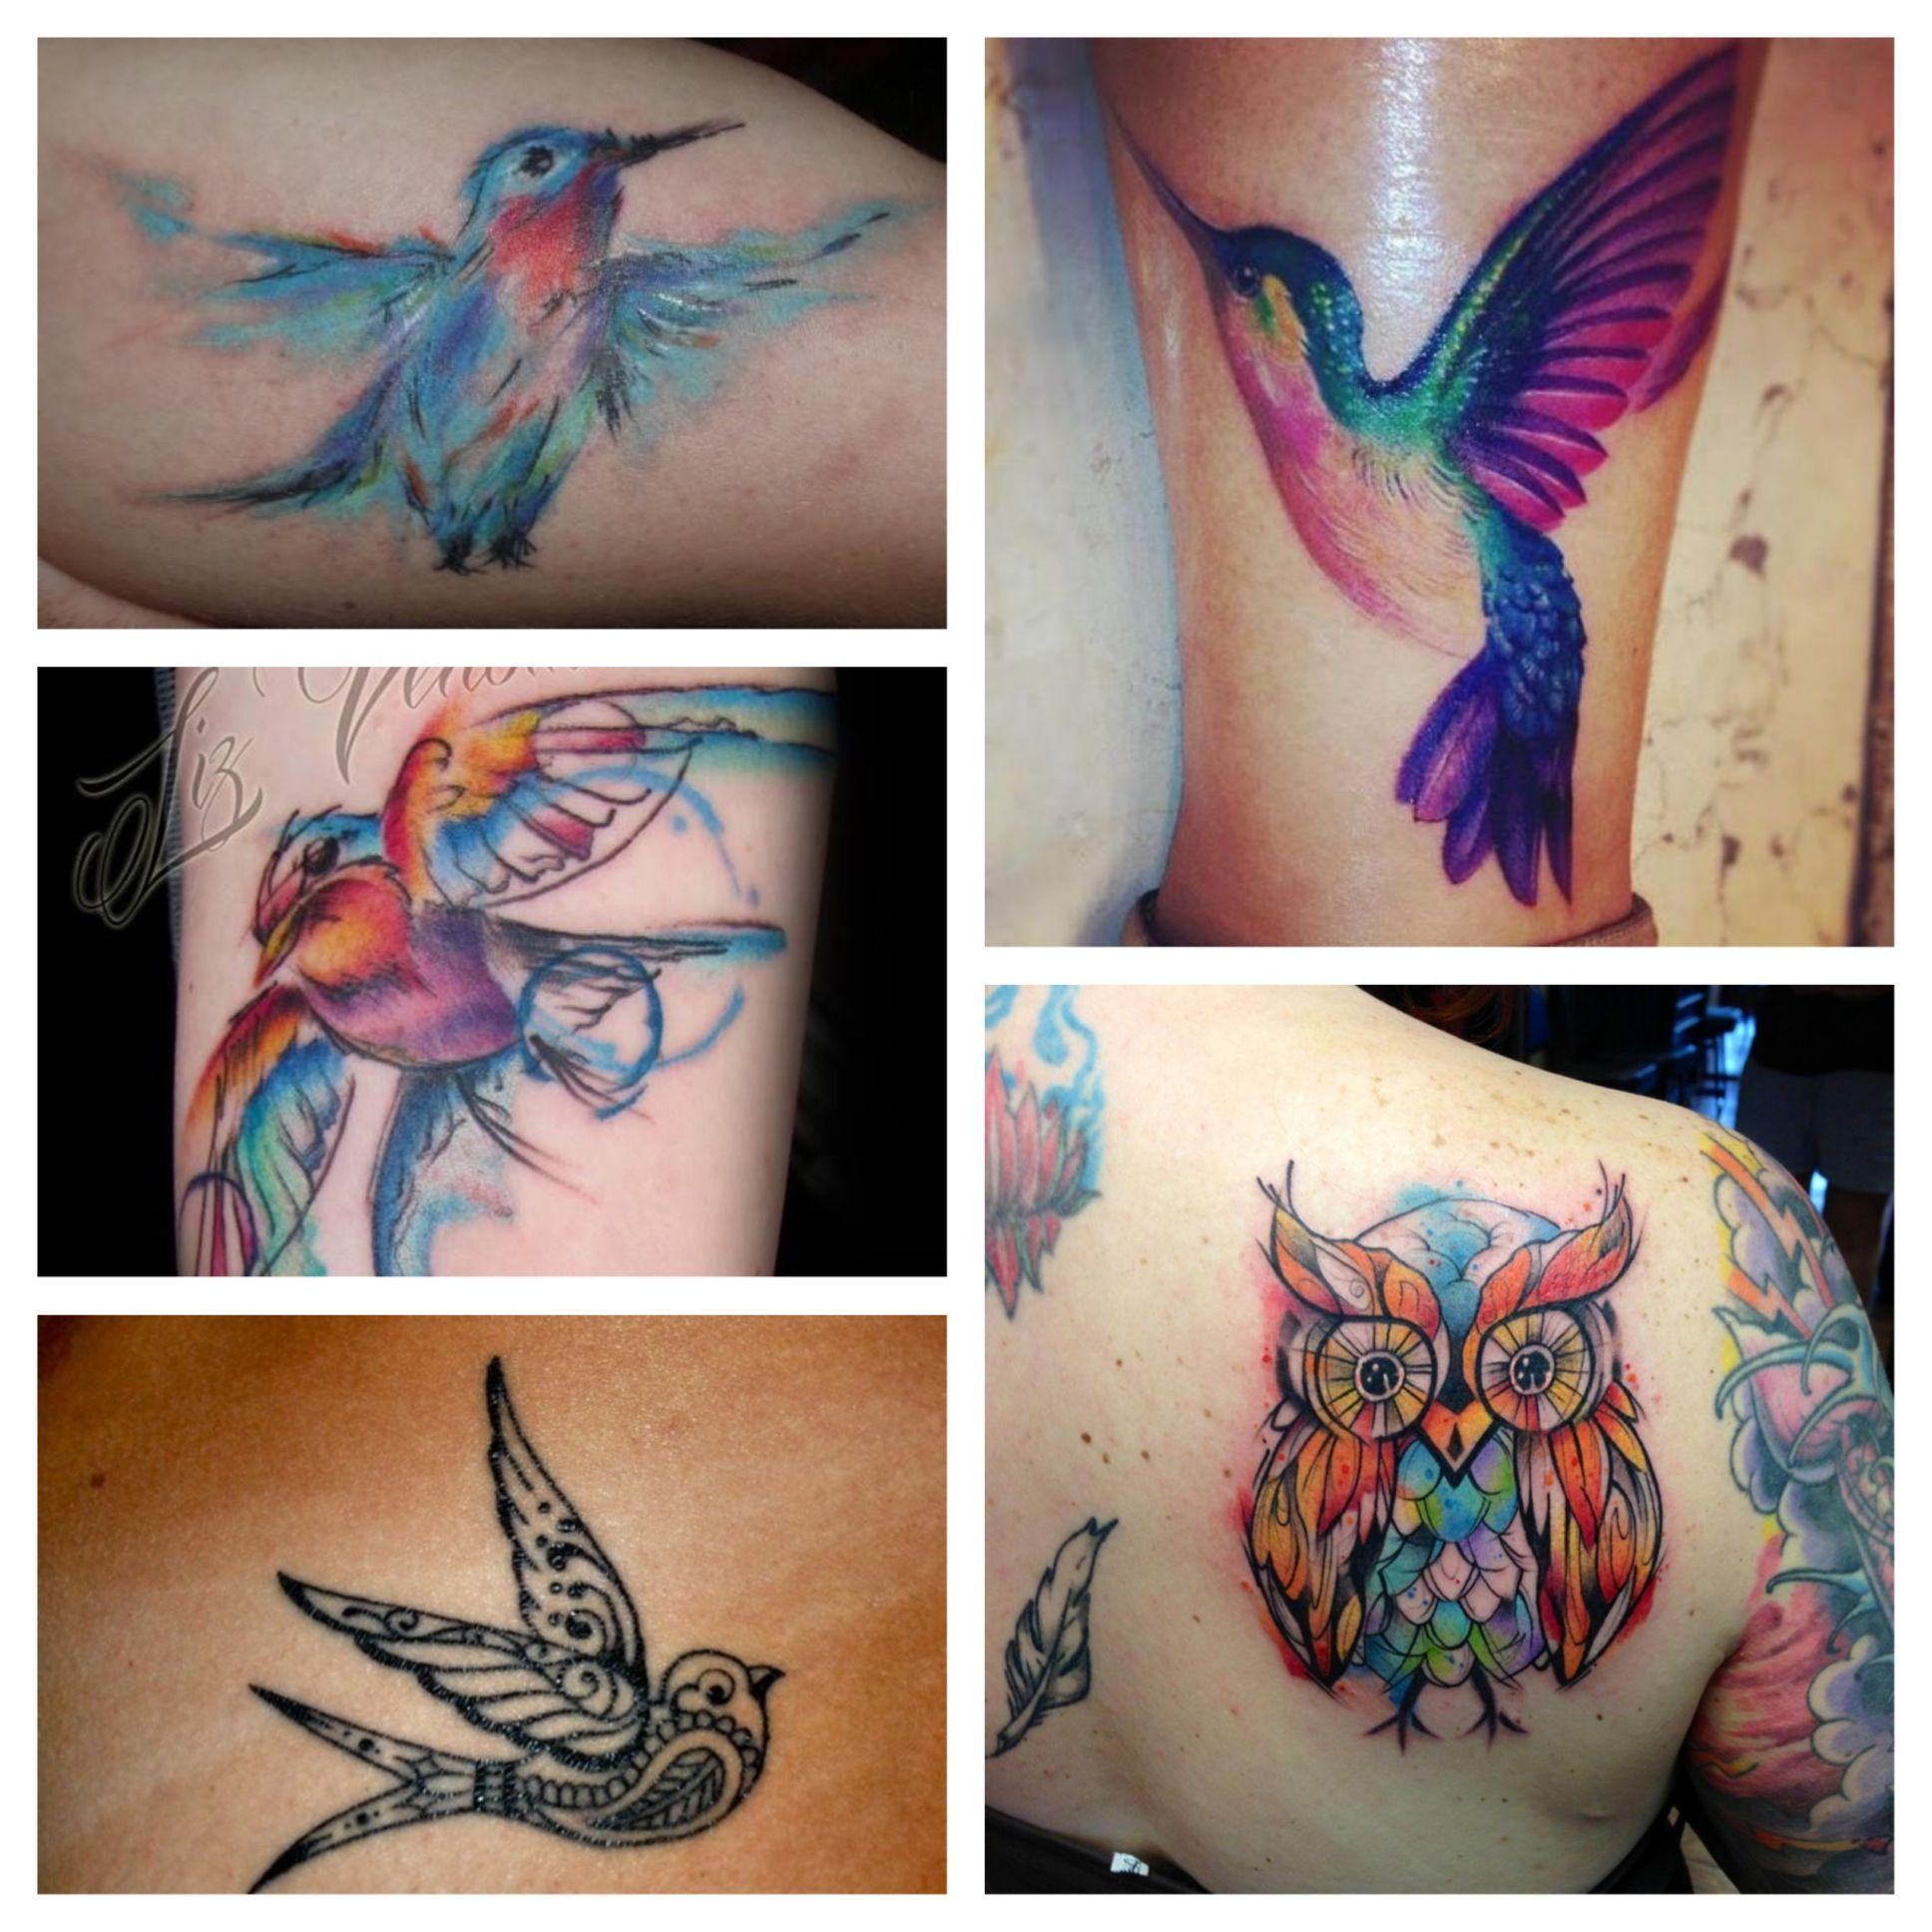 watercolor tattoo ideas- love